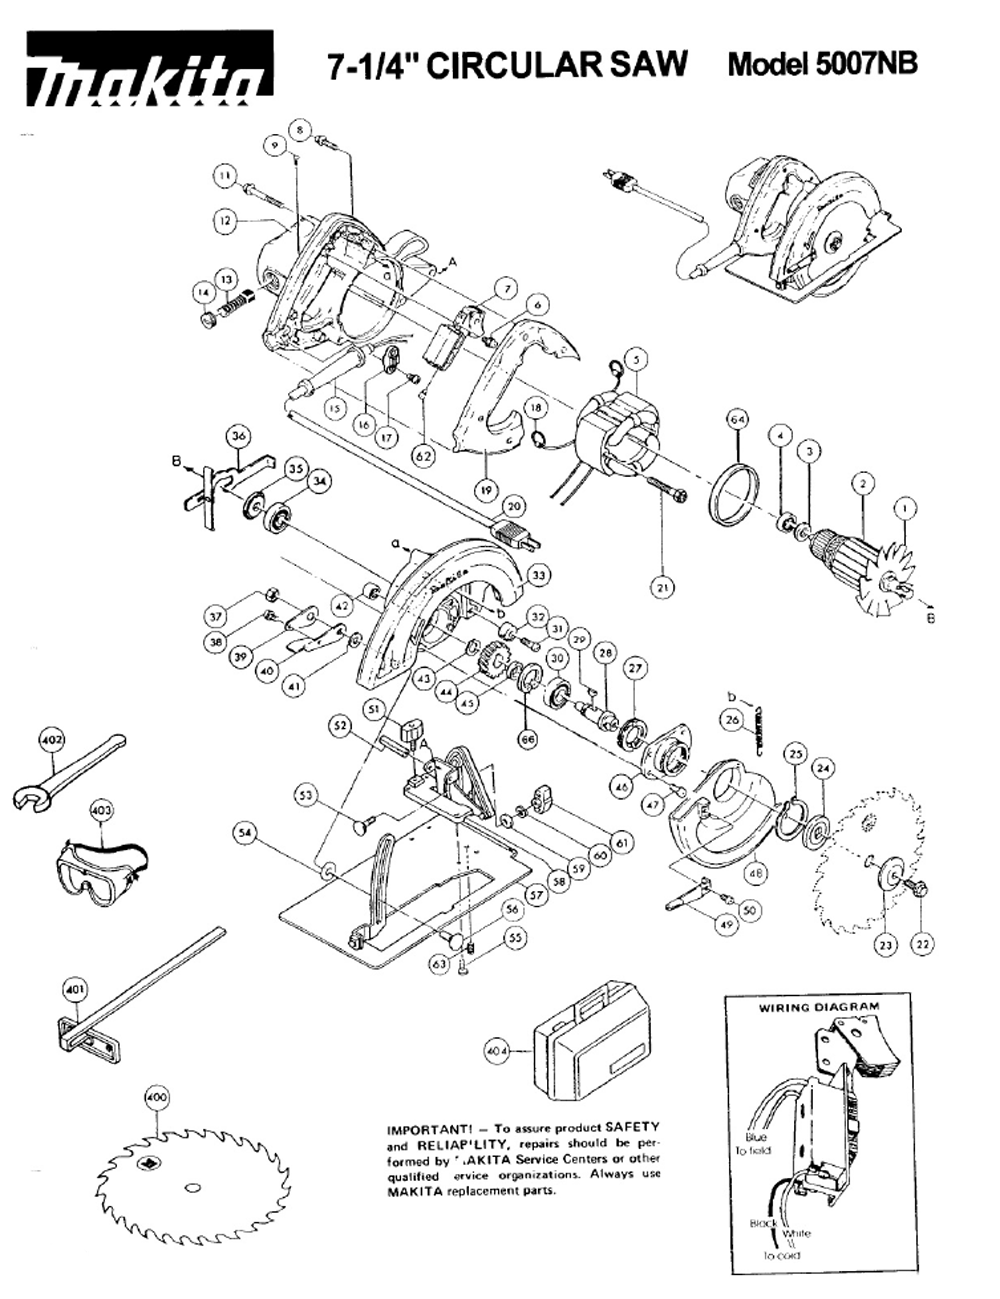 hight resolution of pin by brant powell on tech illustrations electric saw makita tools makita 9227c wiring diagram makita wiring diagram